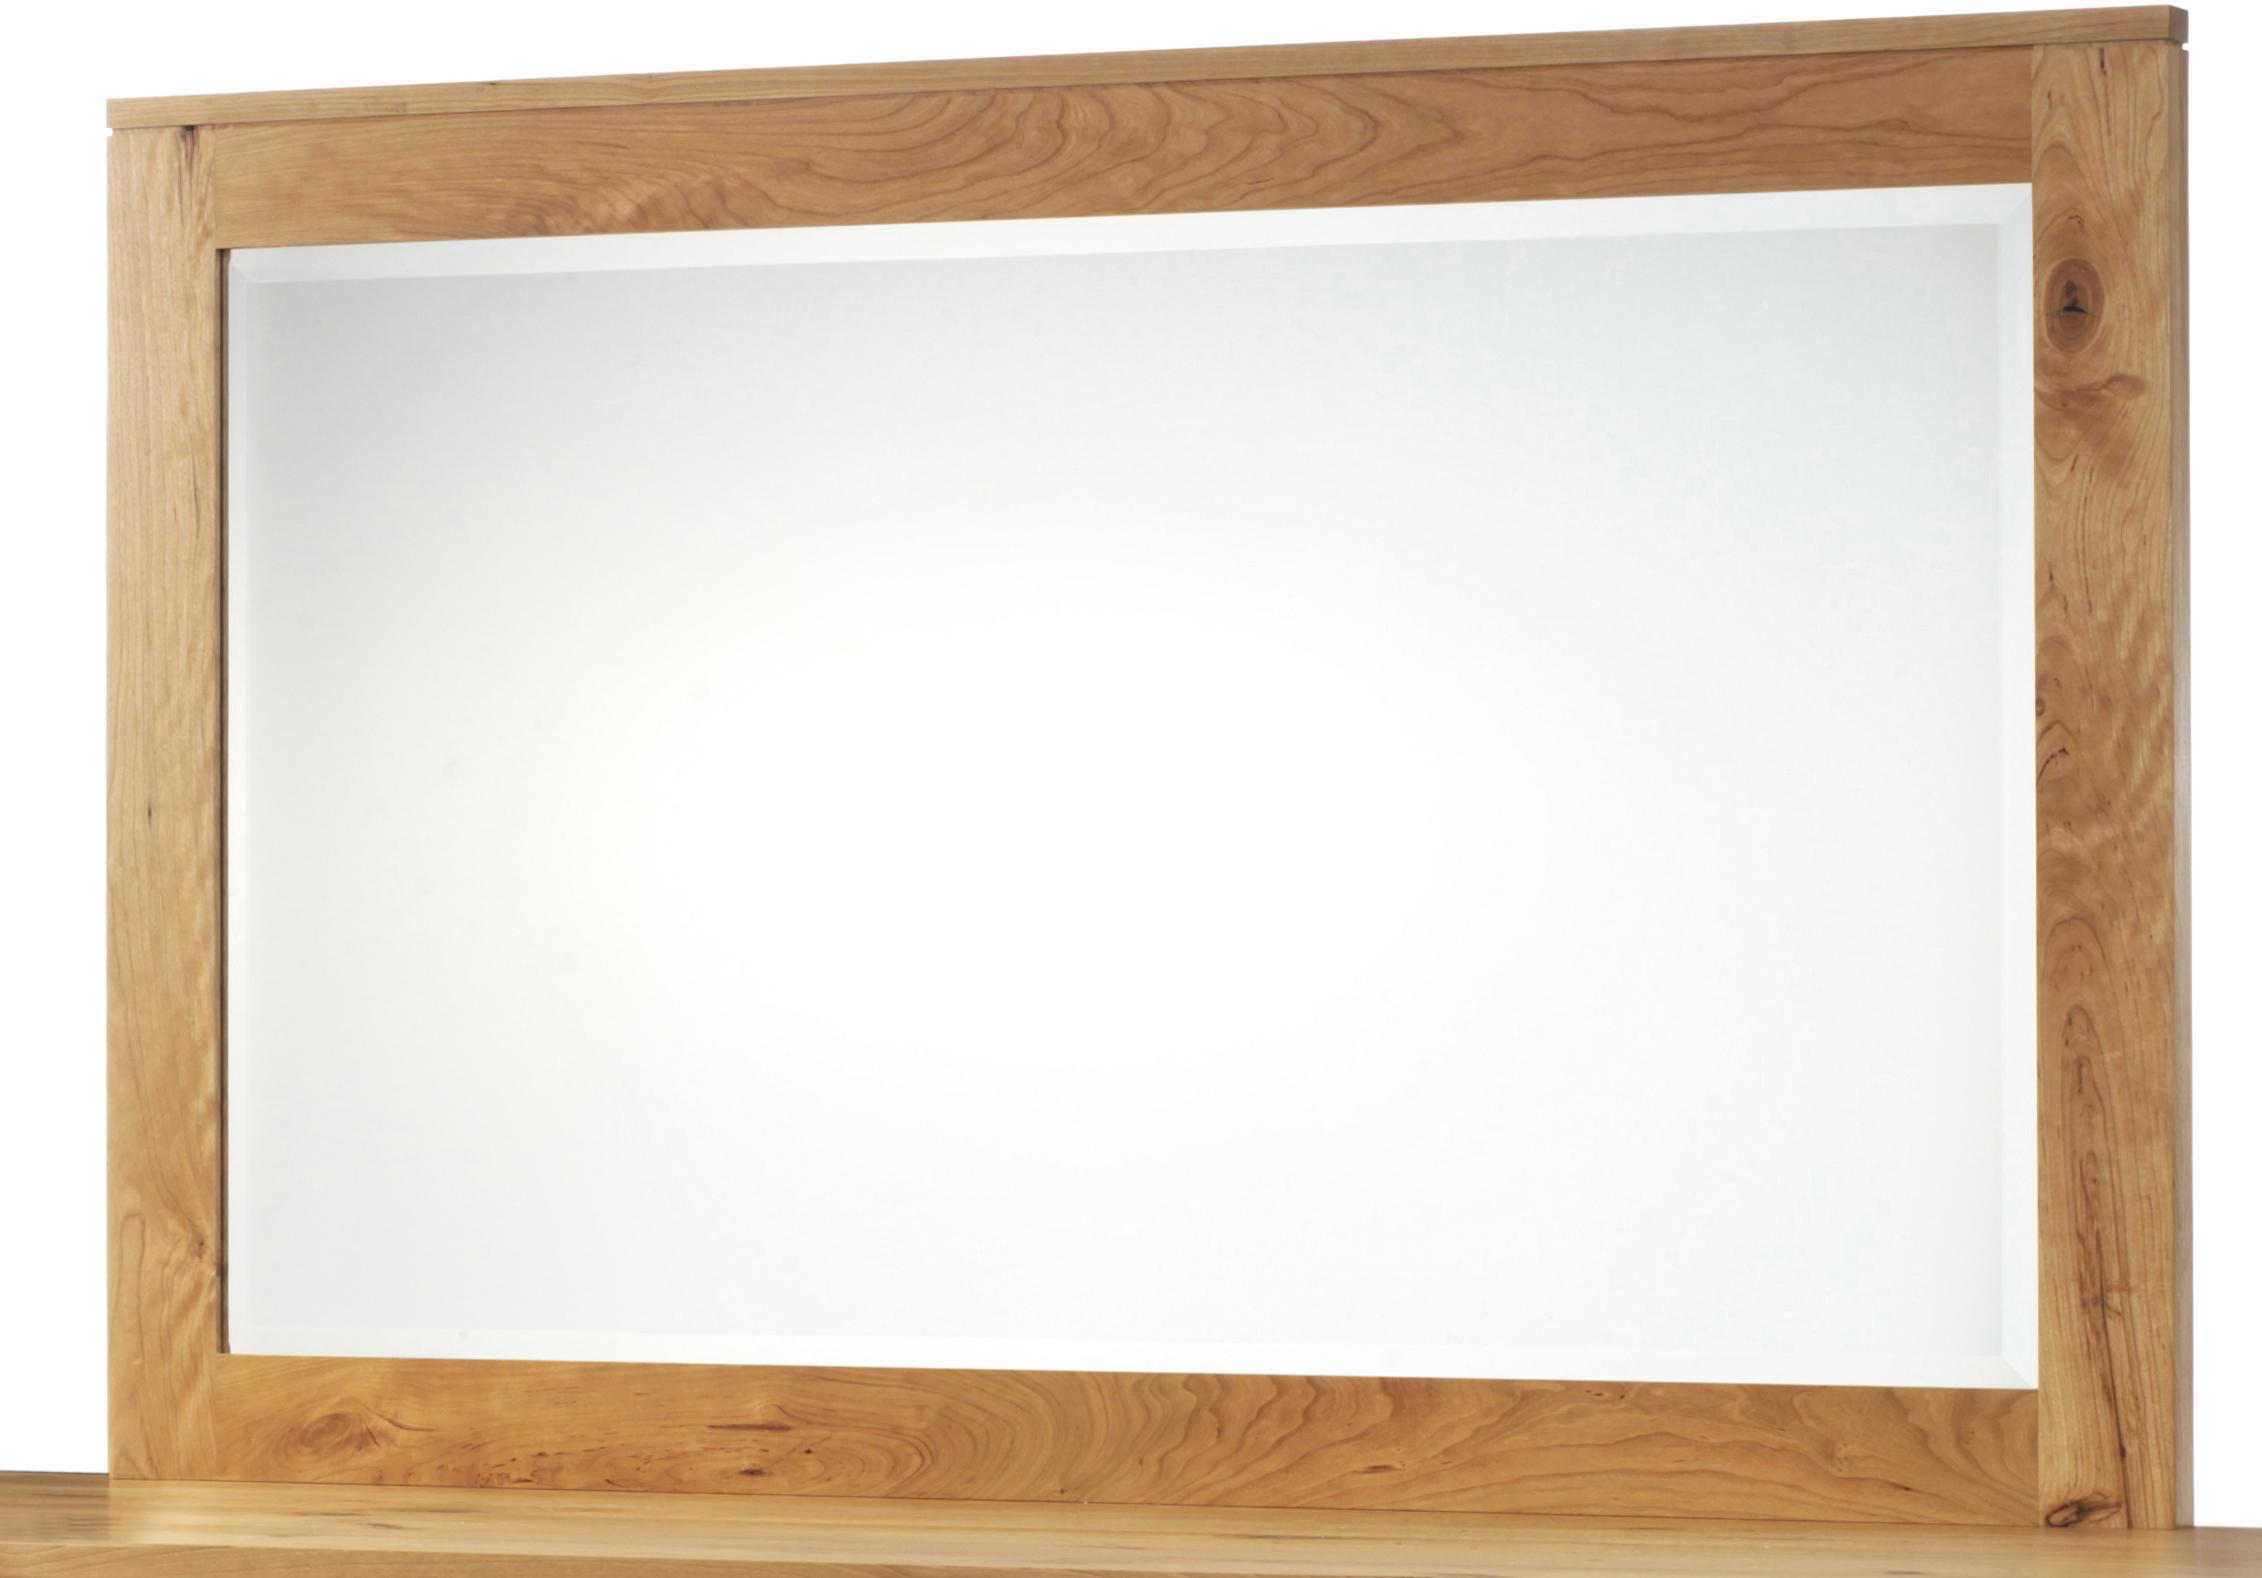 Lynnwood Dresser Mirror by Millcraft at Saugerties Furniture Mart